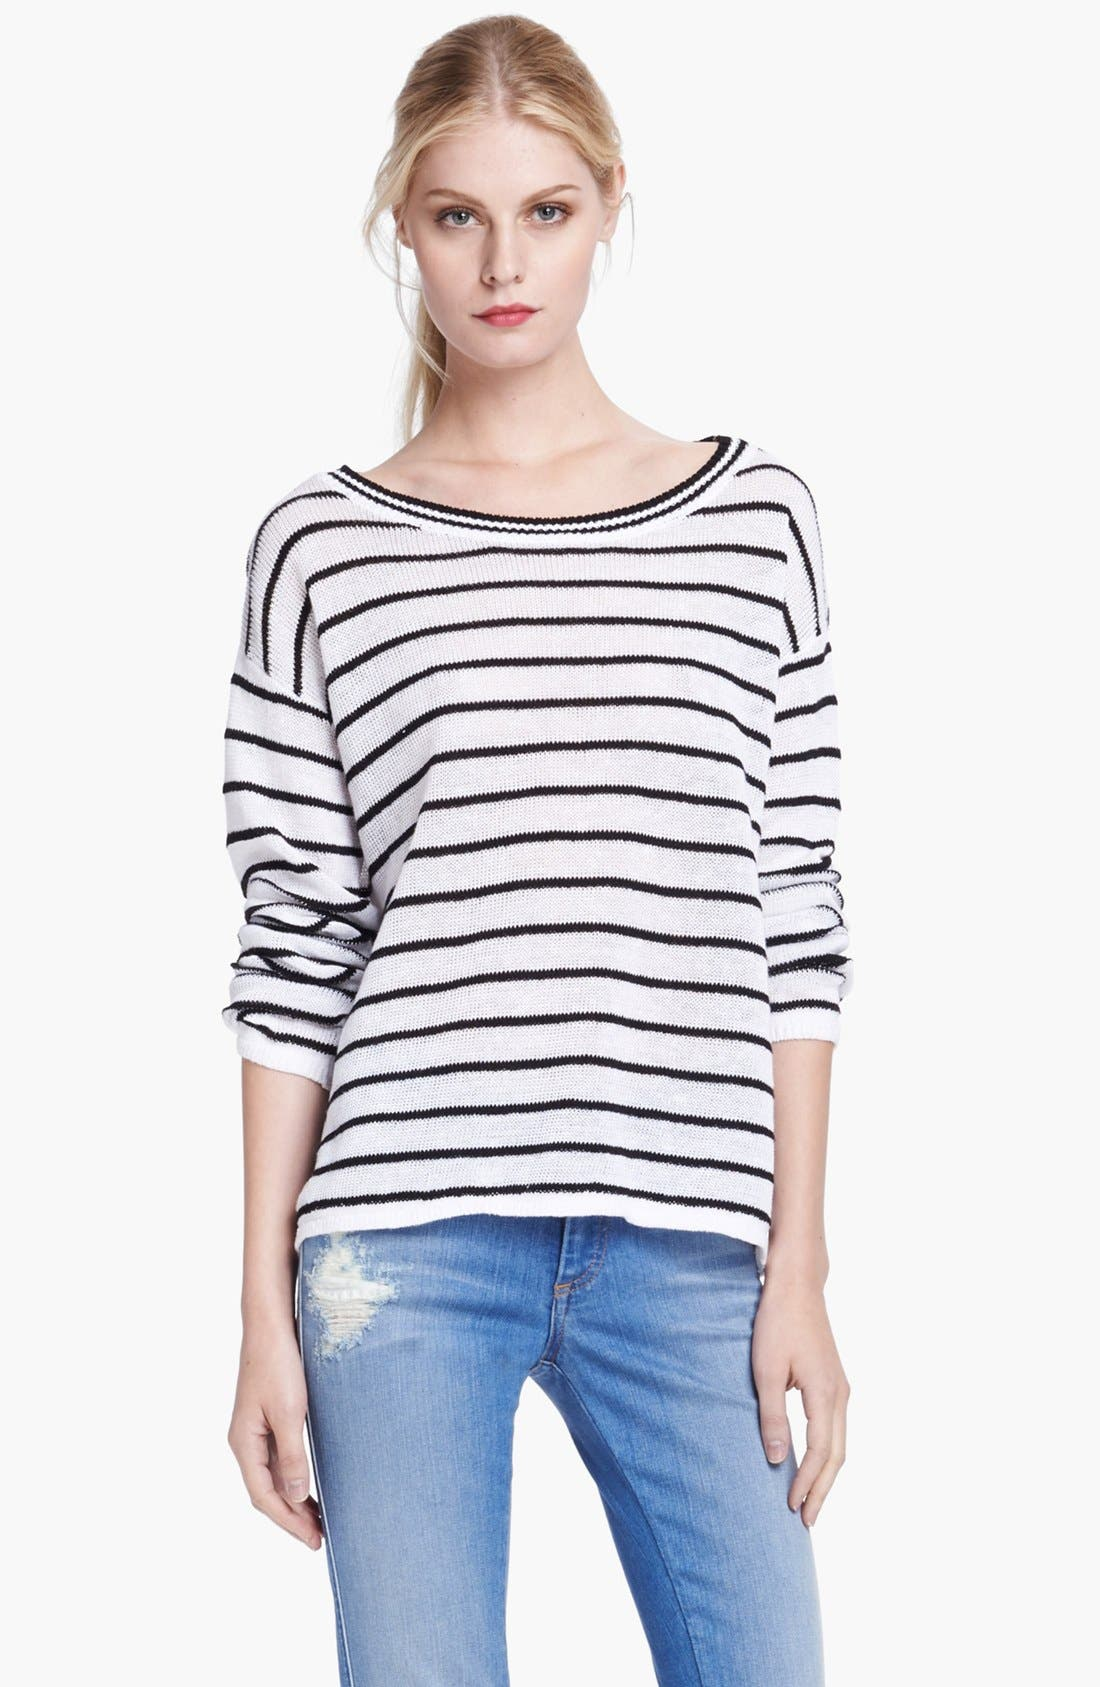 Alternate Image 1 Selected - Alice + Olivia Boxy Pinstripe Sweater